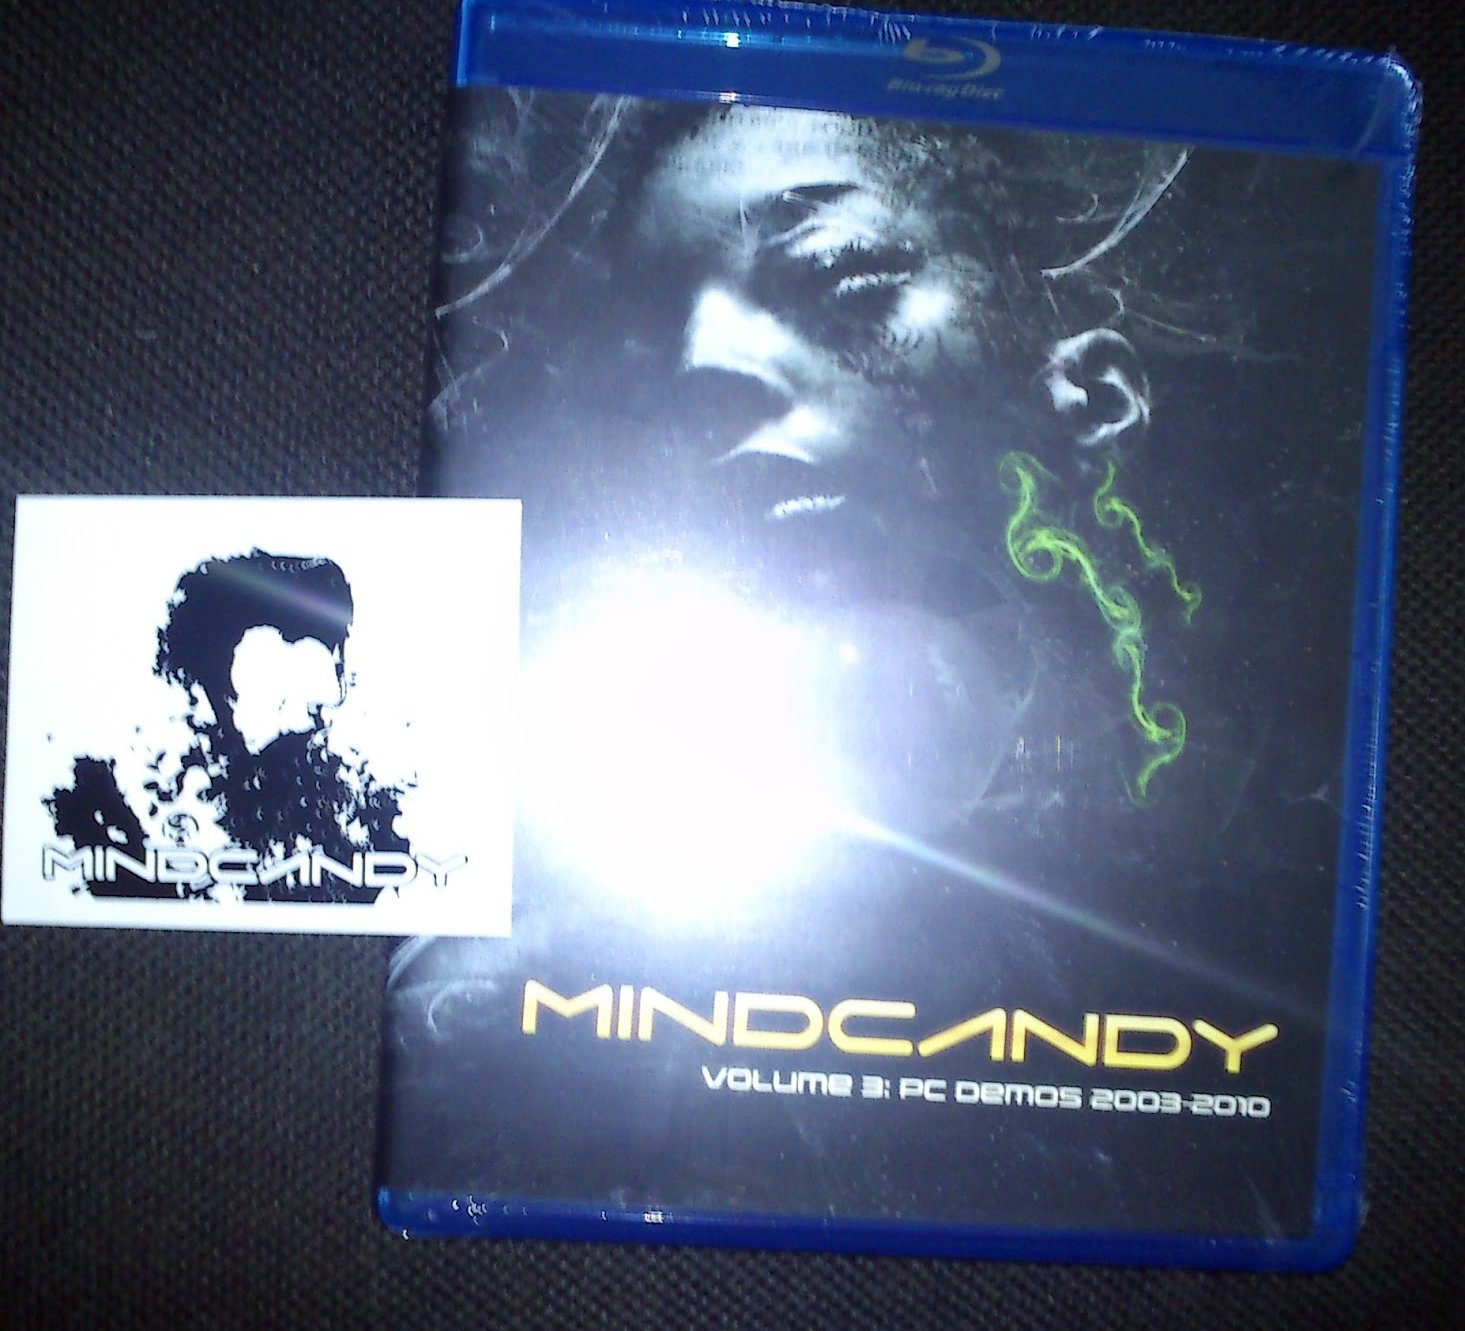 MindCandy DVD vol. 3